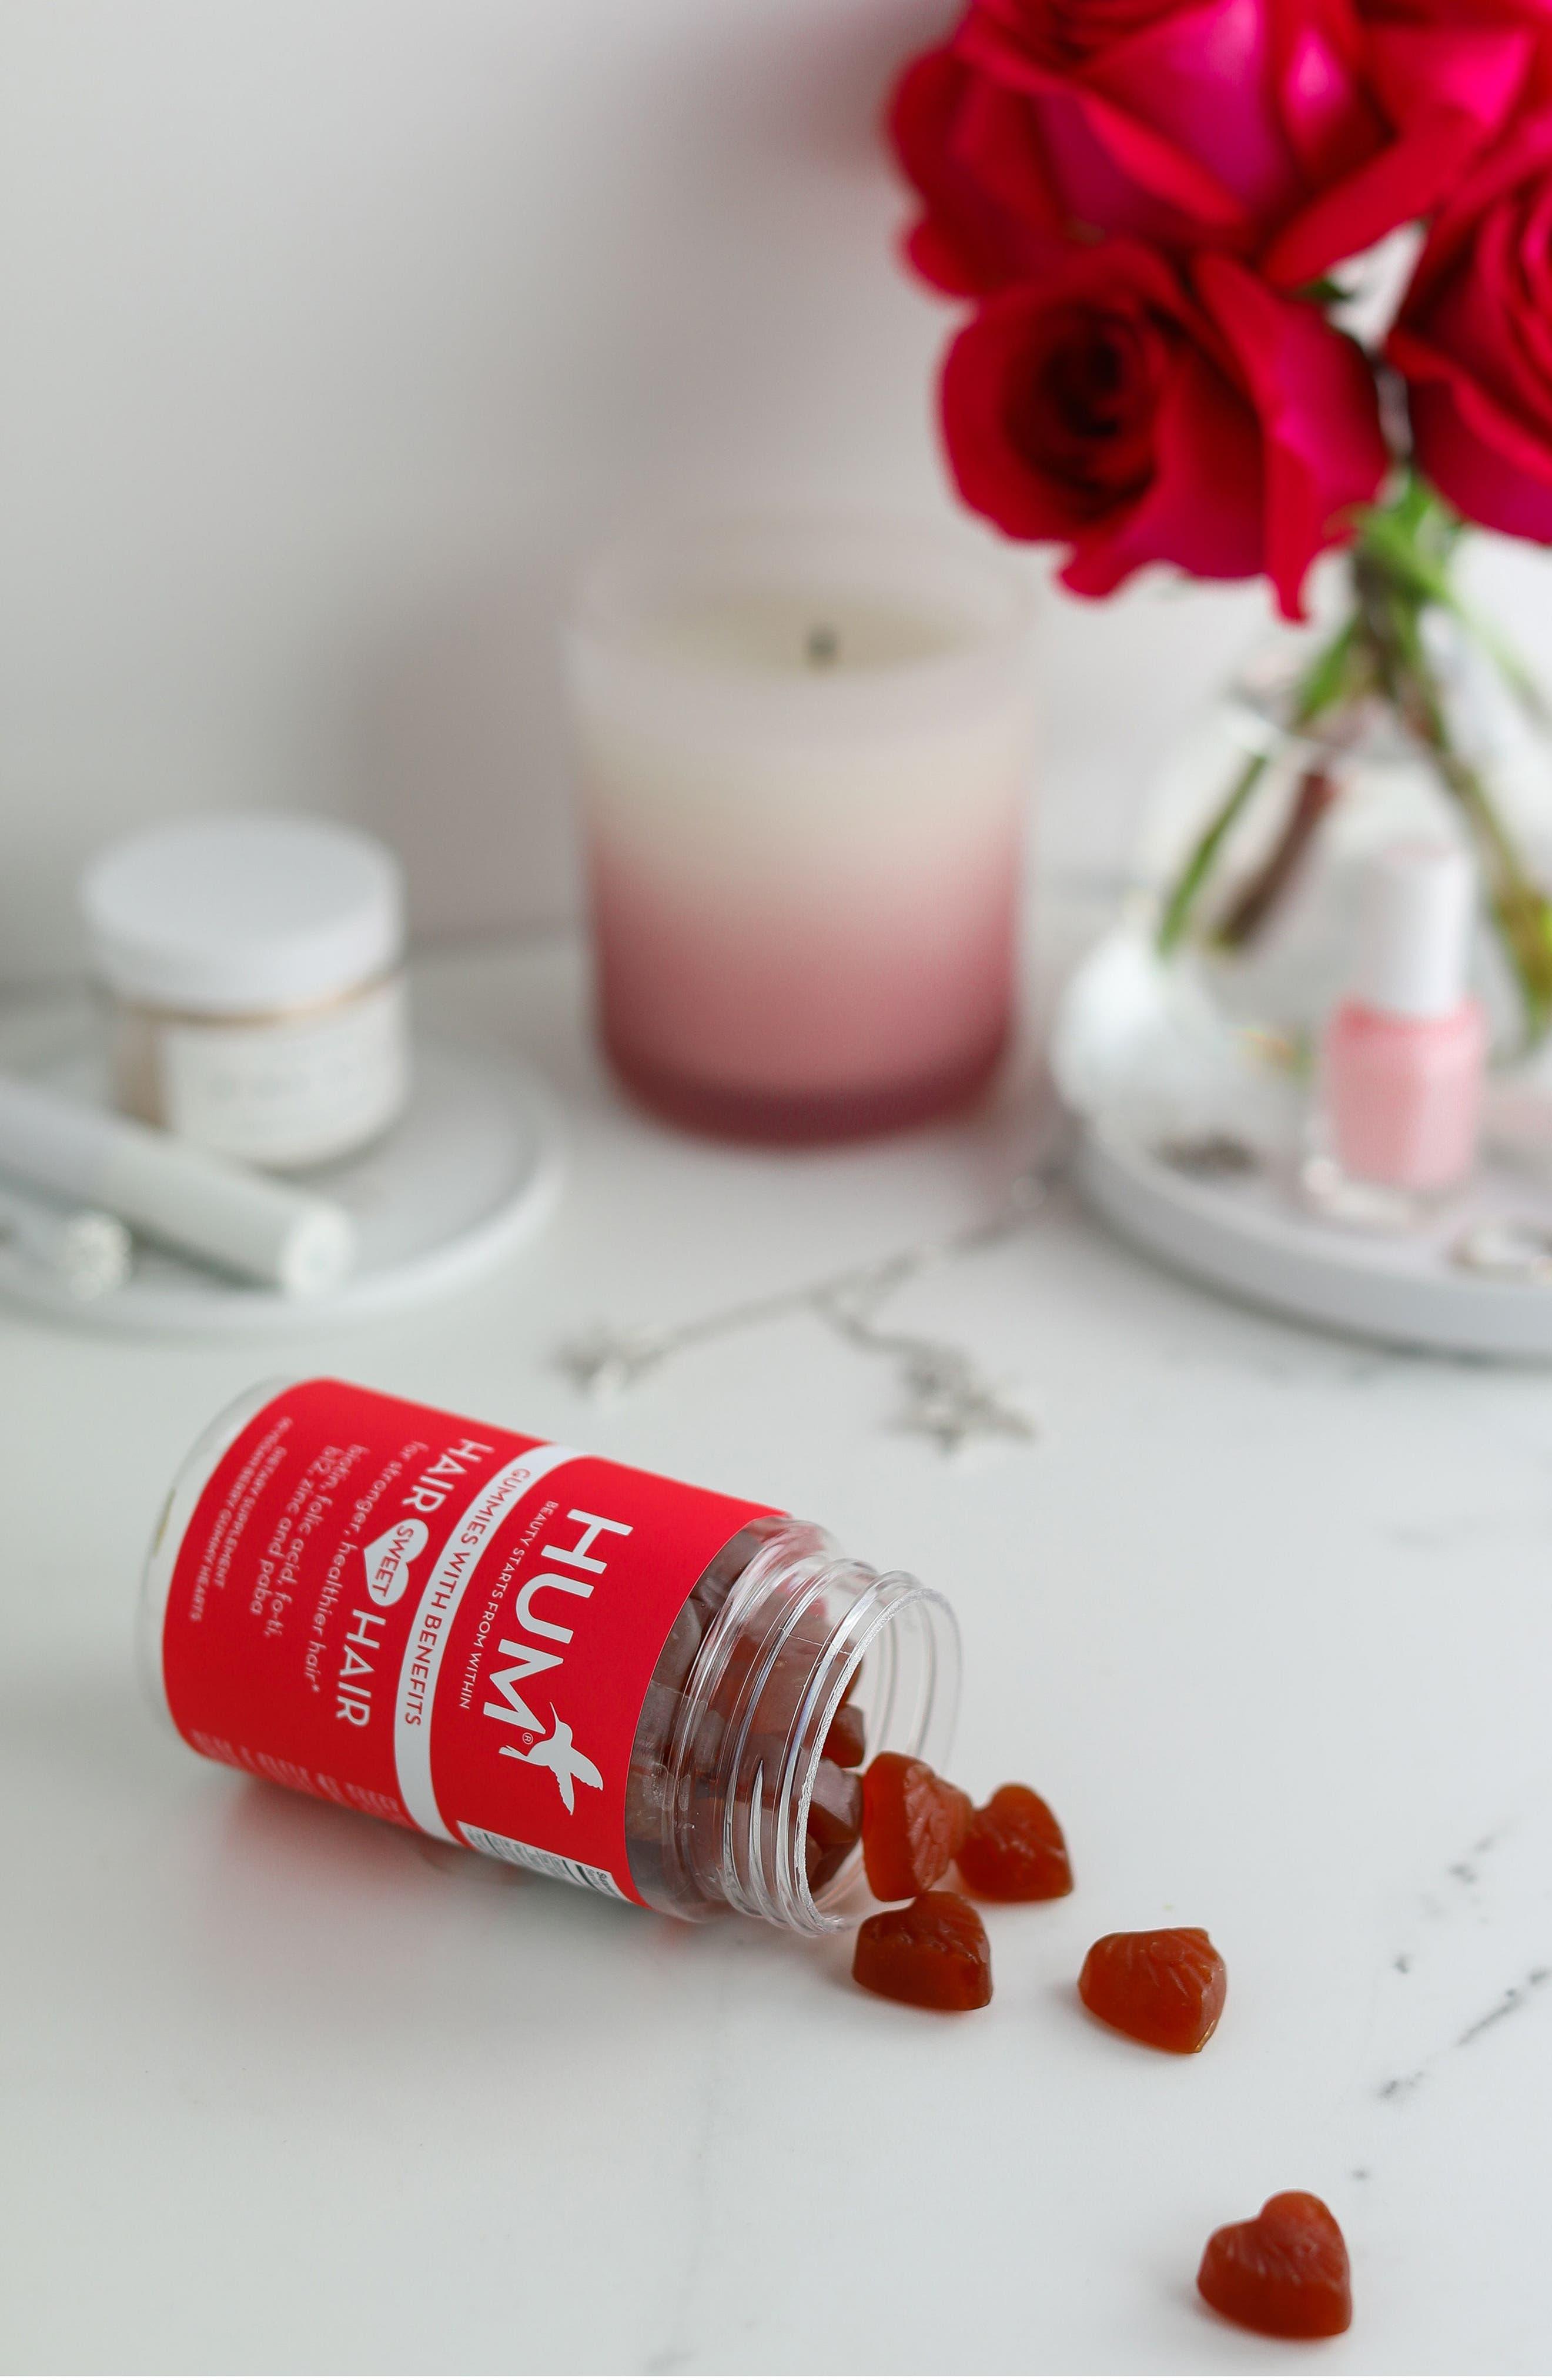 Hair Sweet Hair Gummies Supplement for Healthy Hair,                             Alternate thumbnail 6, color,                             NO COLOR